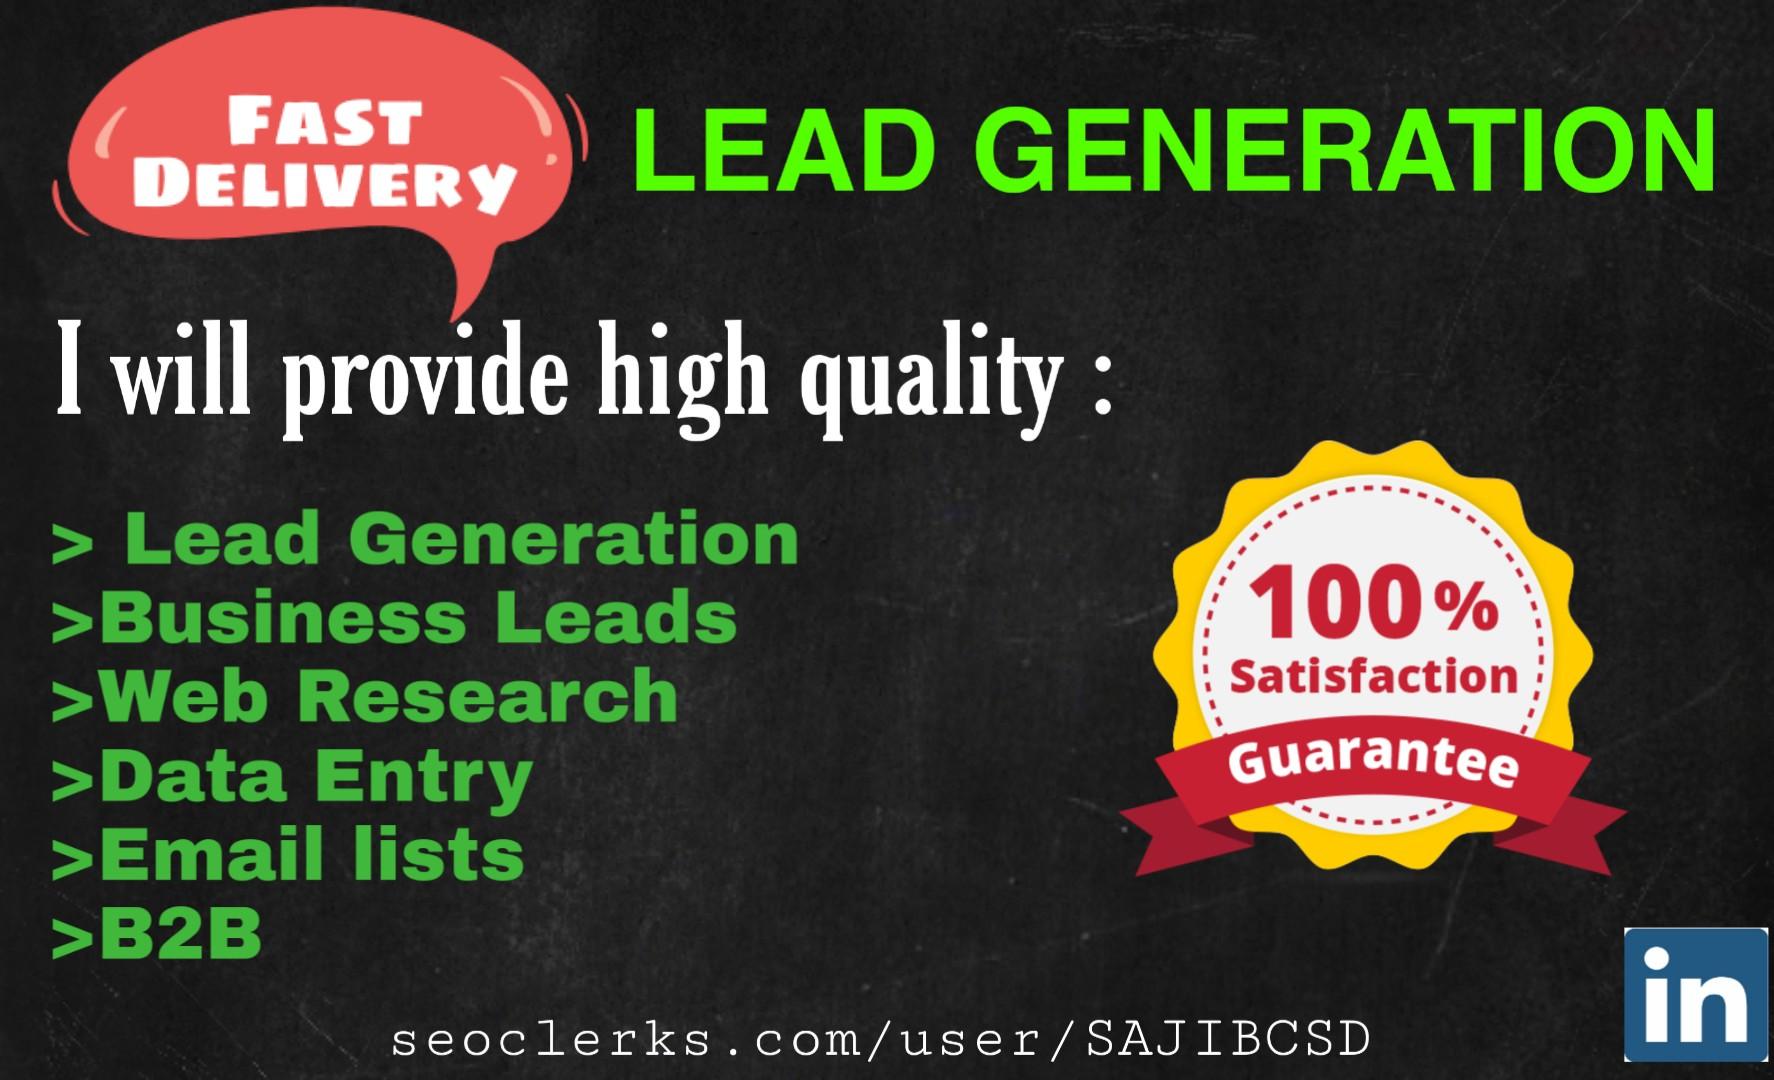 I will do 20 b2b lead generation